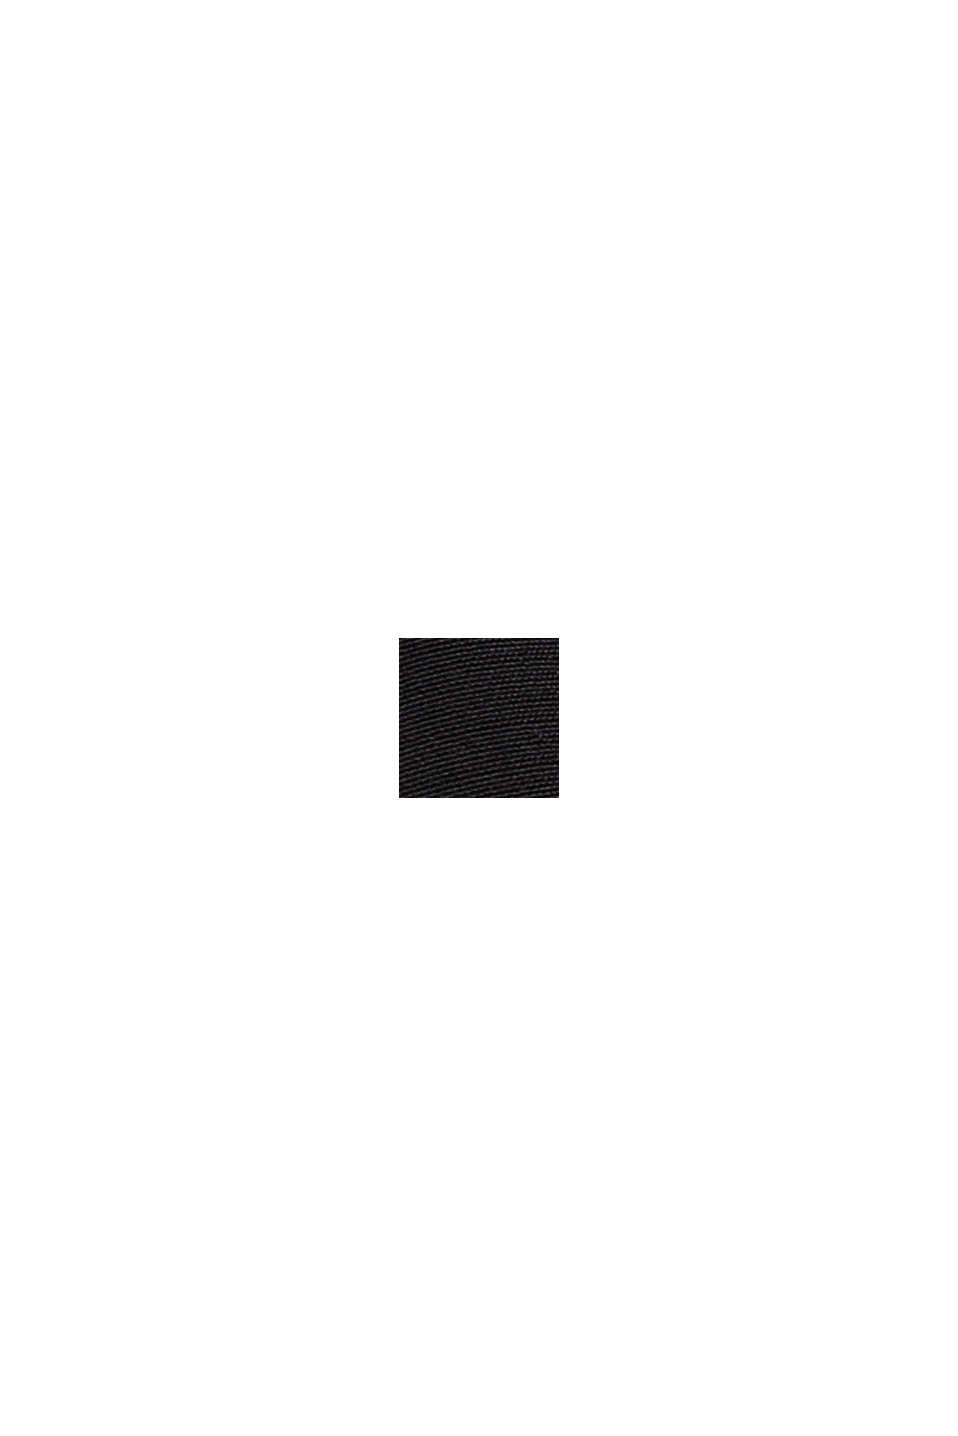 Längere Tunika-Bluse mit LENZING™ ECOVERO™, BLACK, swatch